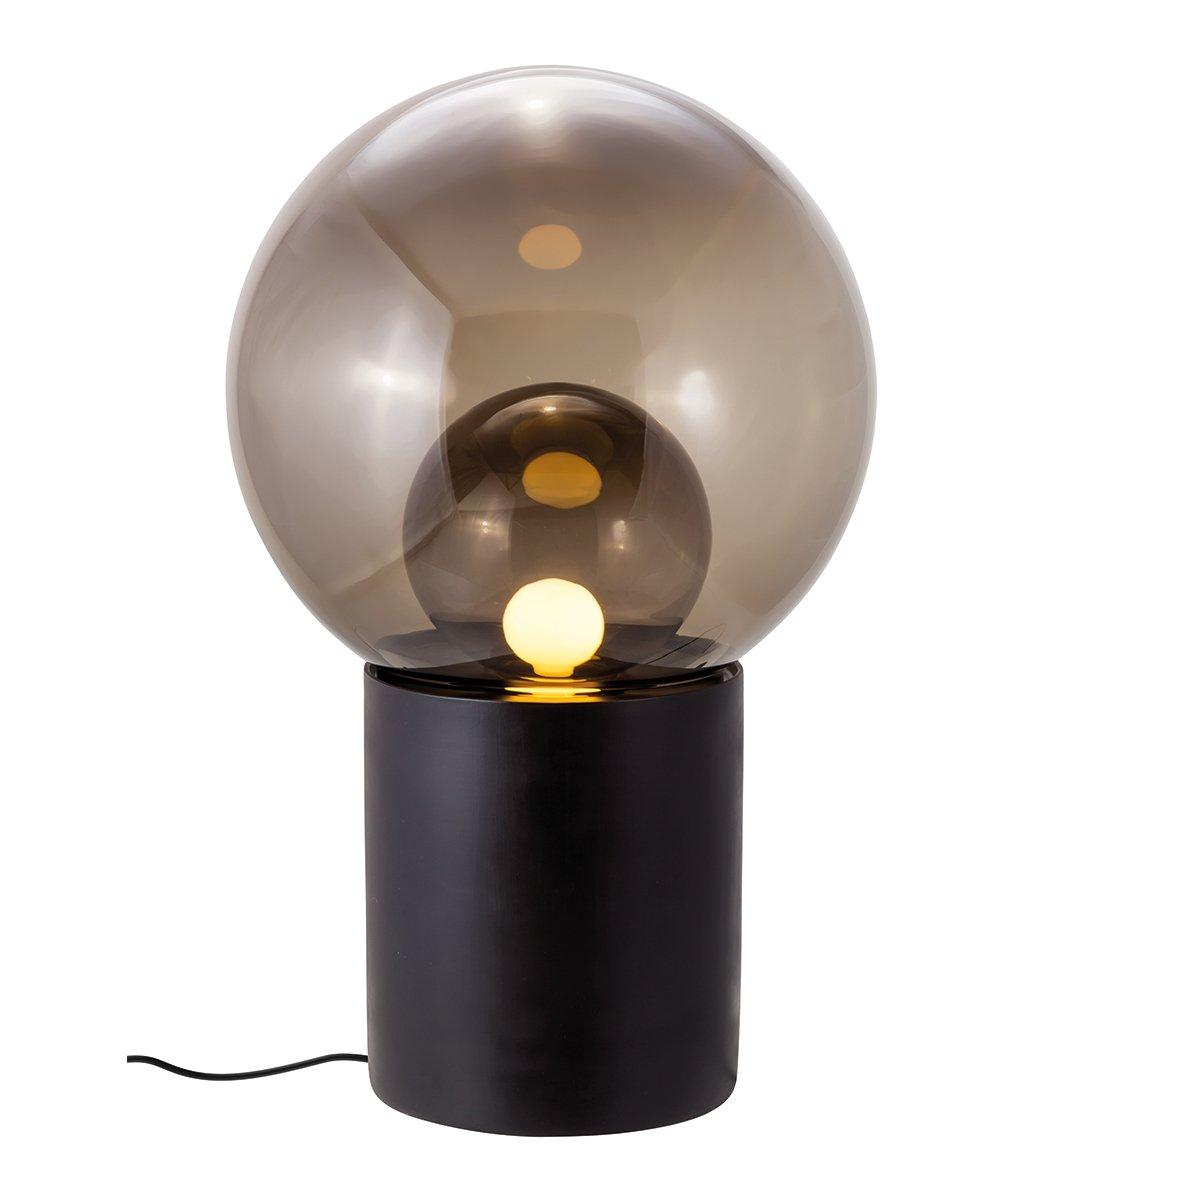 Pulpo Boule High Vloerlamp - Zwart - Smoke Grey